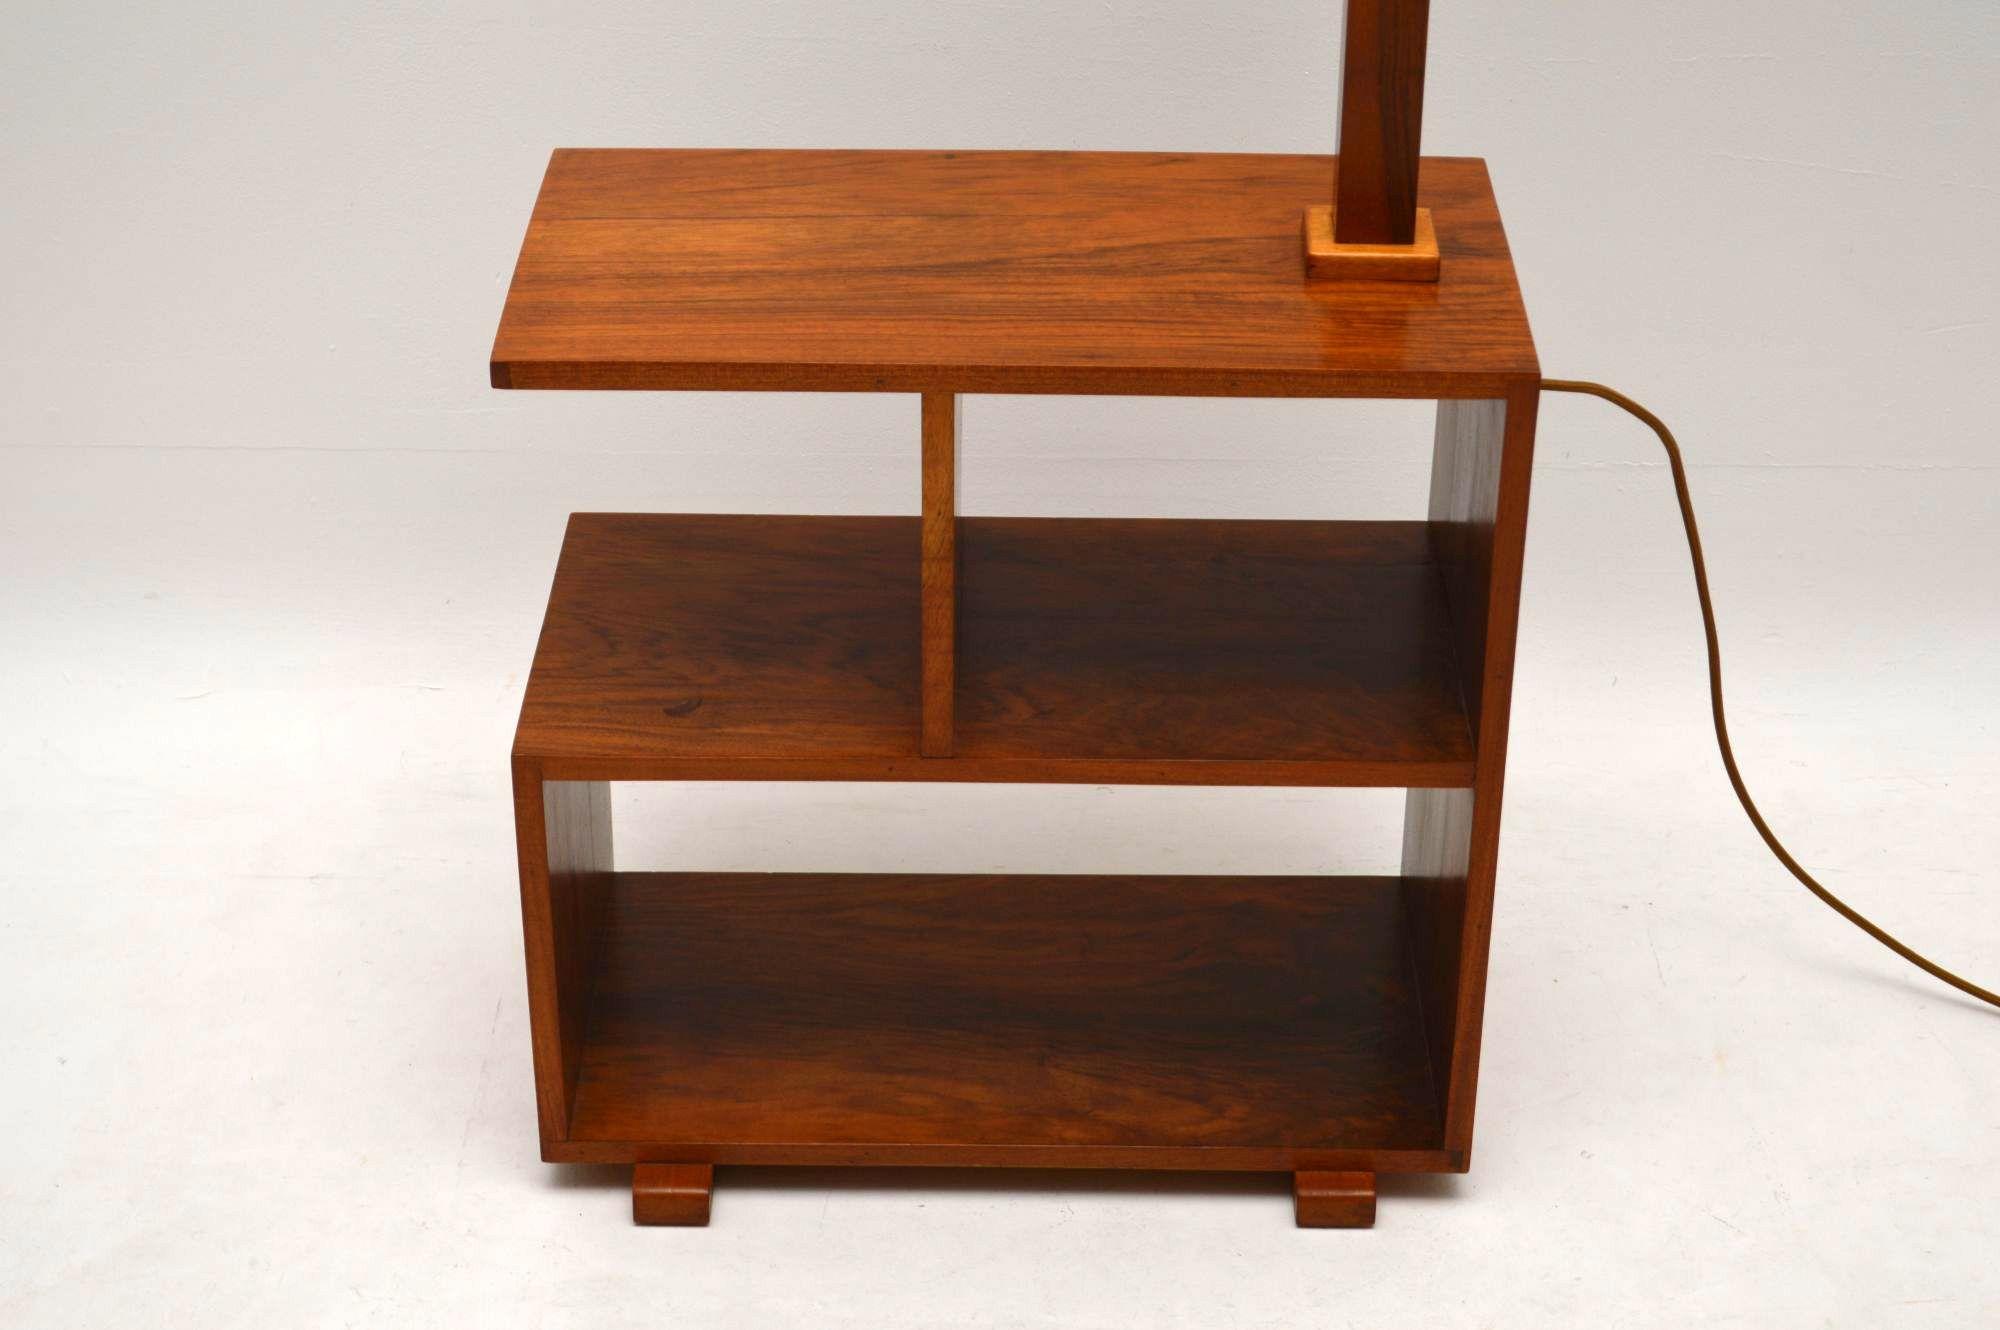 Vintage Art Deco Walnut Lamp Side Table Retrospective